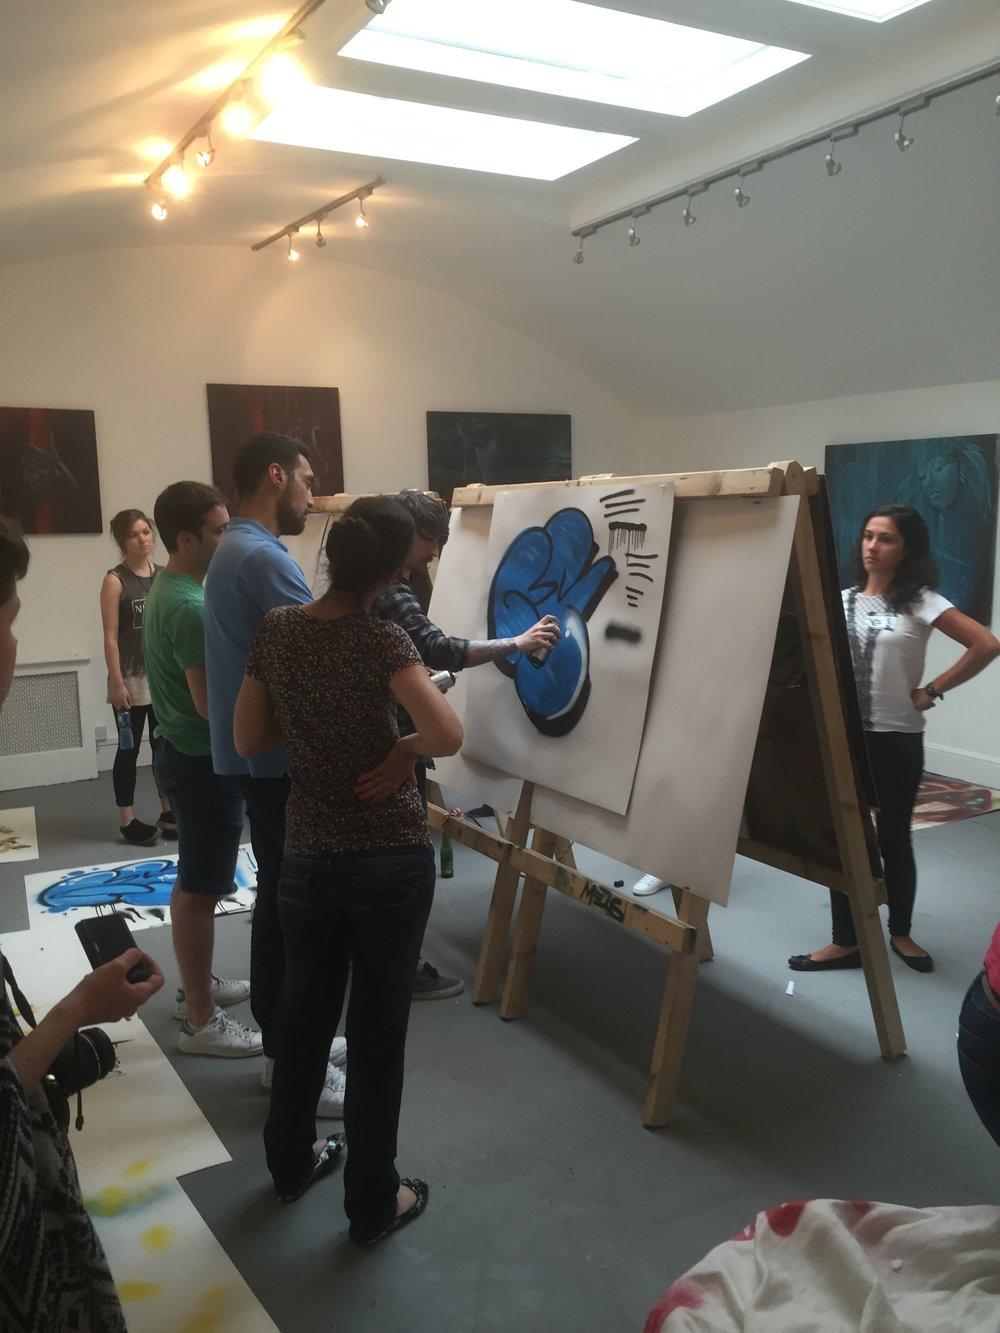 Google-Team-Bulding-Event-The-Kemp-Gallery-Dublin-Ireland-14.JPG